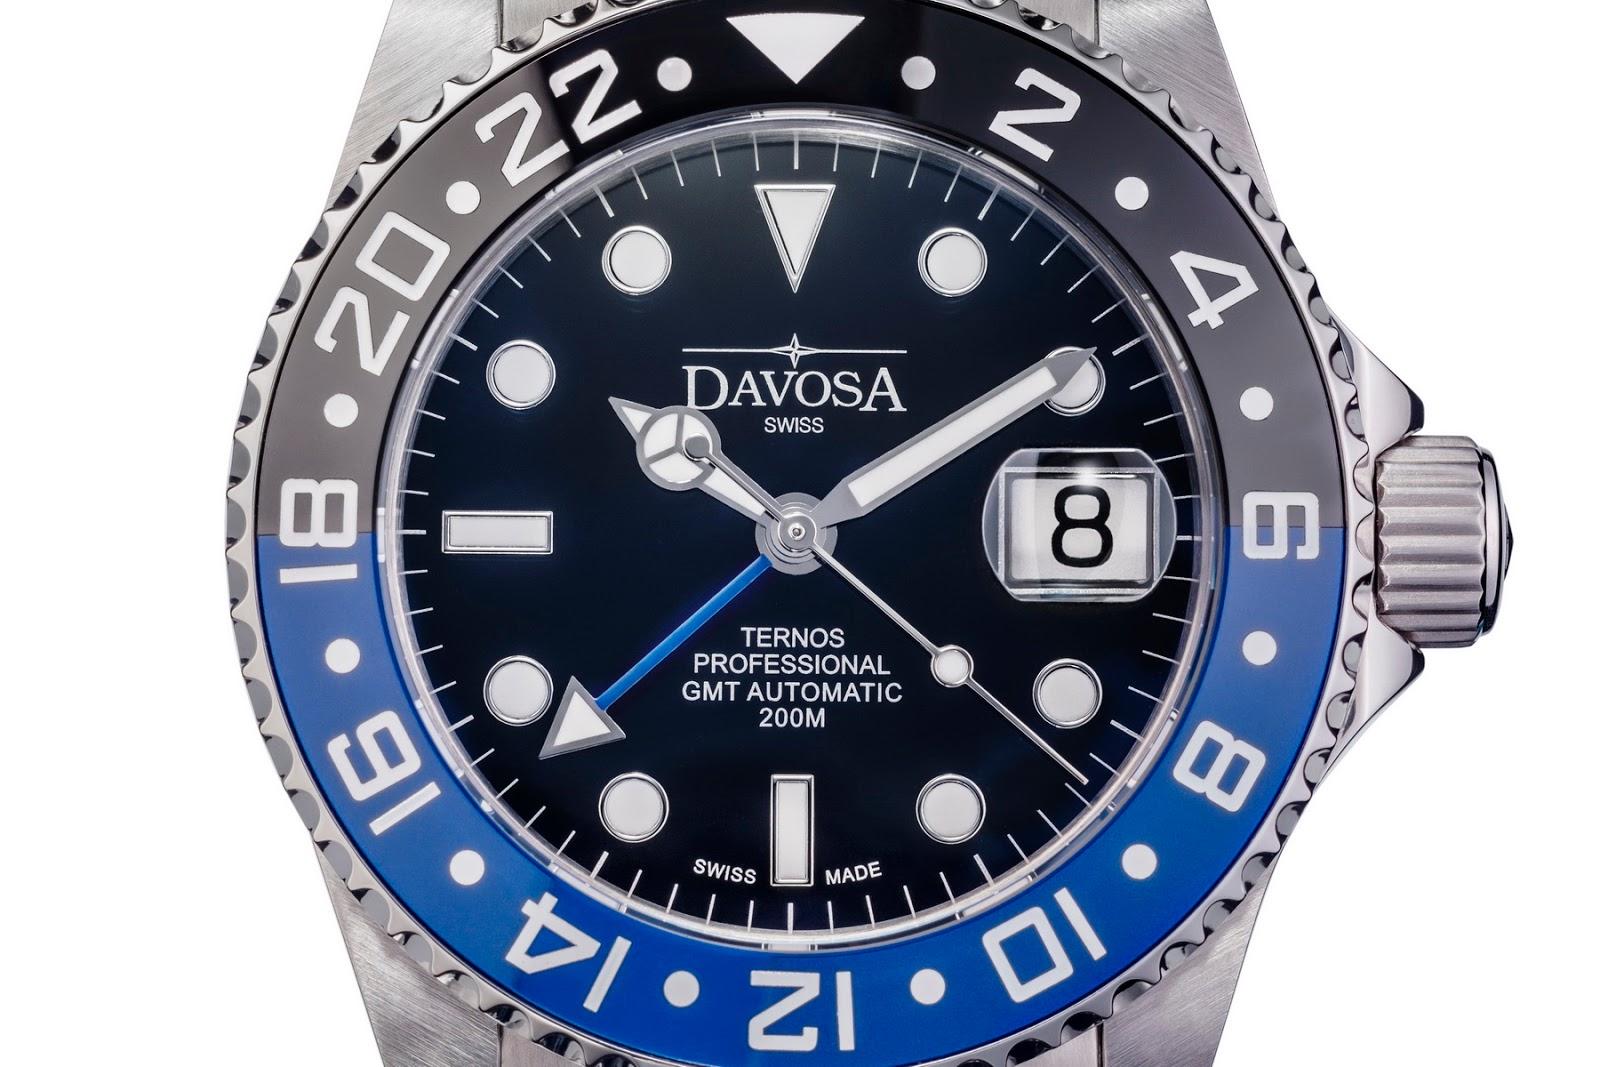 davosa gmt  OceanicTime: DAVOSA Ternos Professional TT GMT